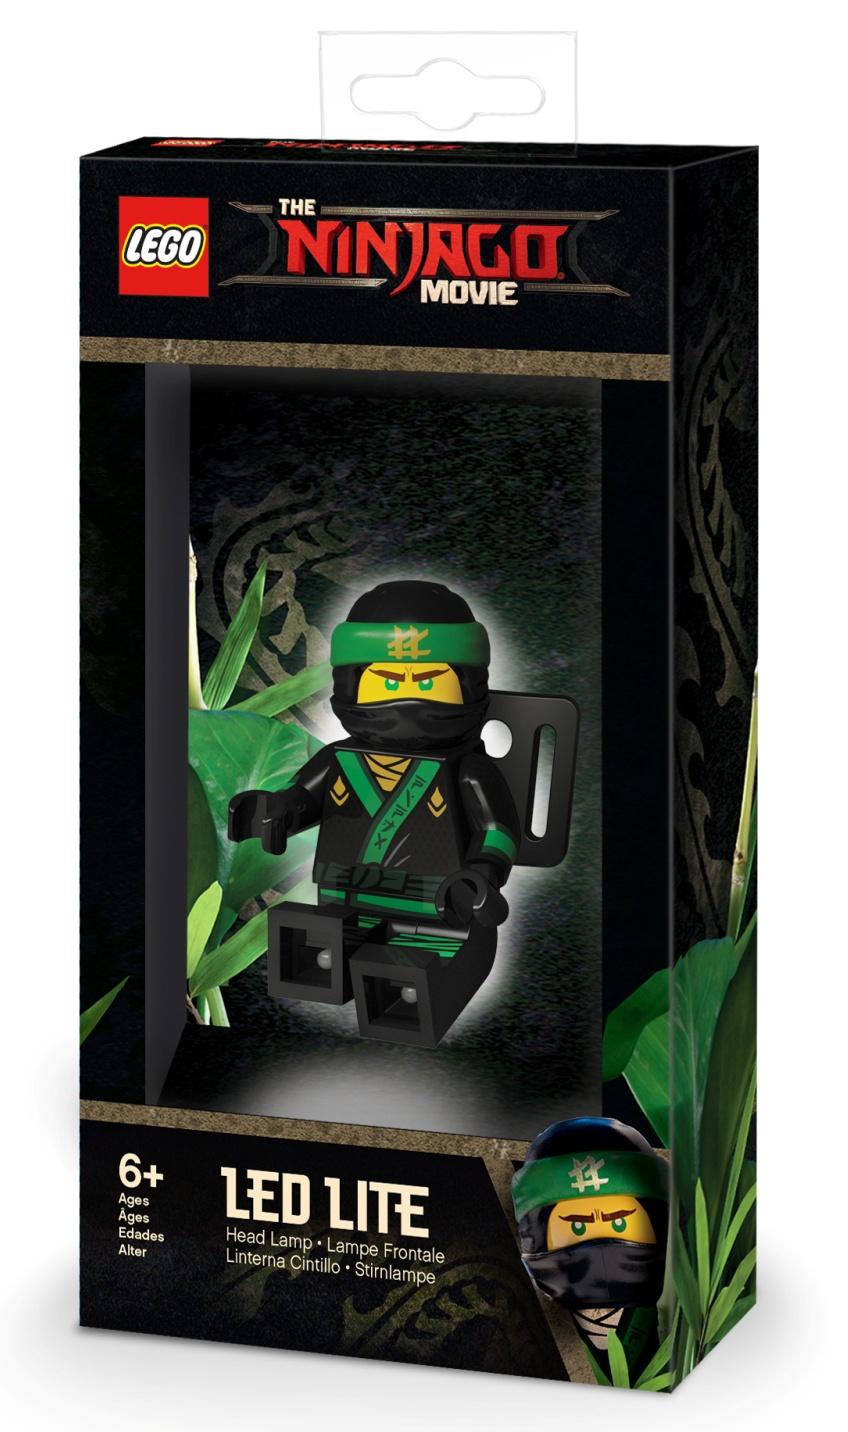 LGL-HE24 Налобный фонарик LEGO Ninjago Movie (Лего Фильм: Ниндзяго)-Lloyd